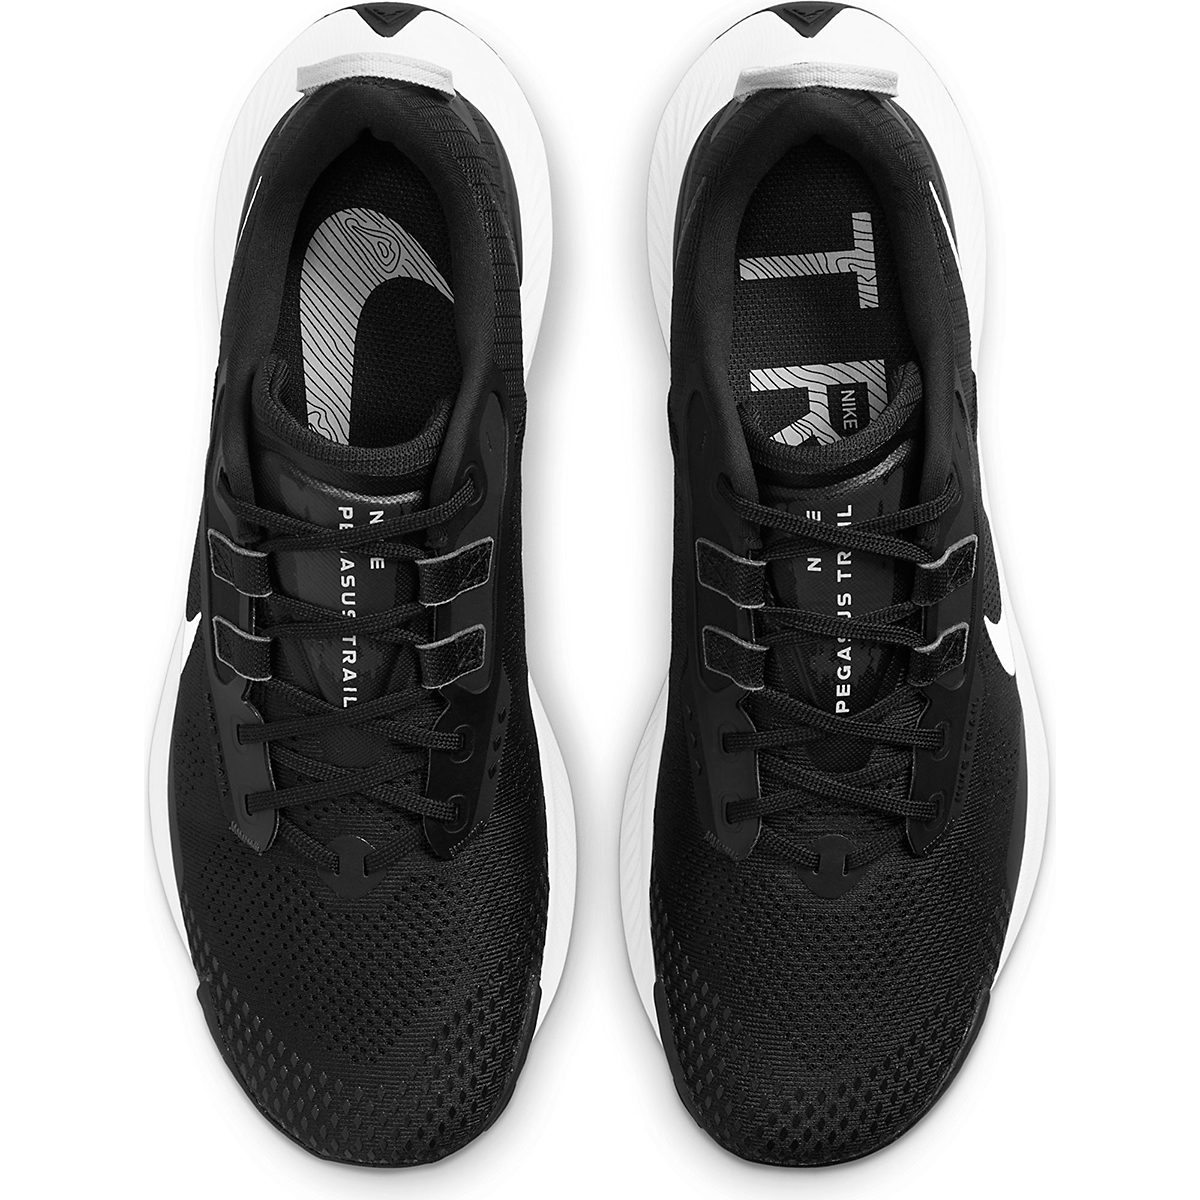 Men's Nike Pegasus Trail 3 Trail Running Shoe  - Color: Black/Pure Platinum/Dark Smoke Grey  - Size: 6 - Width: Regular, Black/Pure Platinum/Dark Smoke Grey, large, image 3